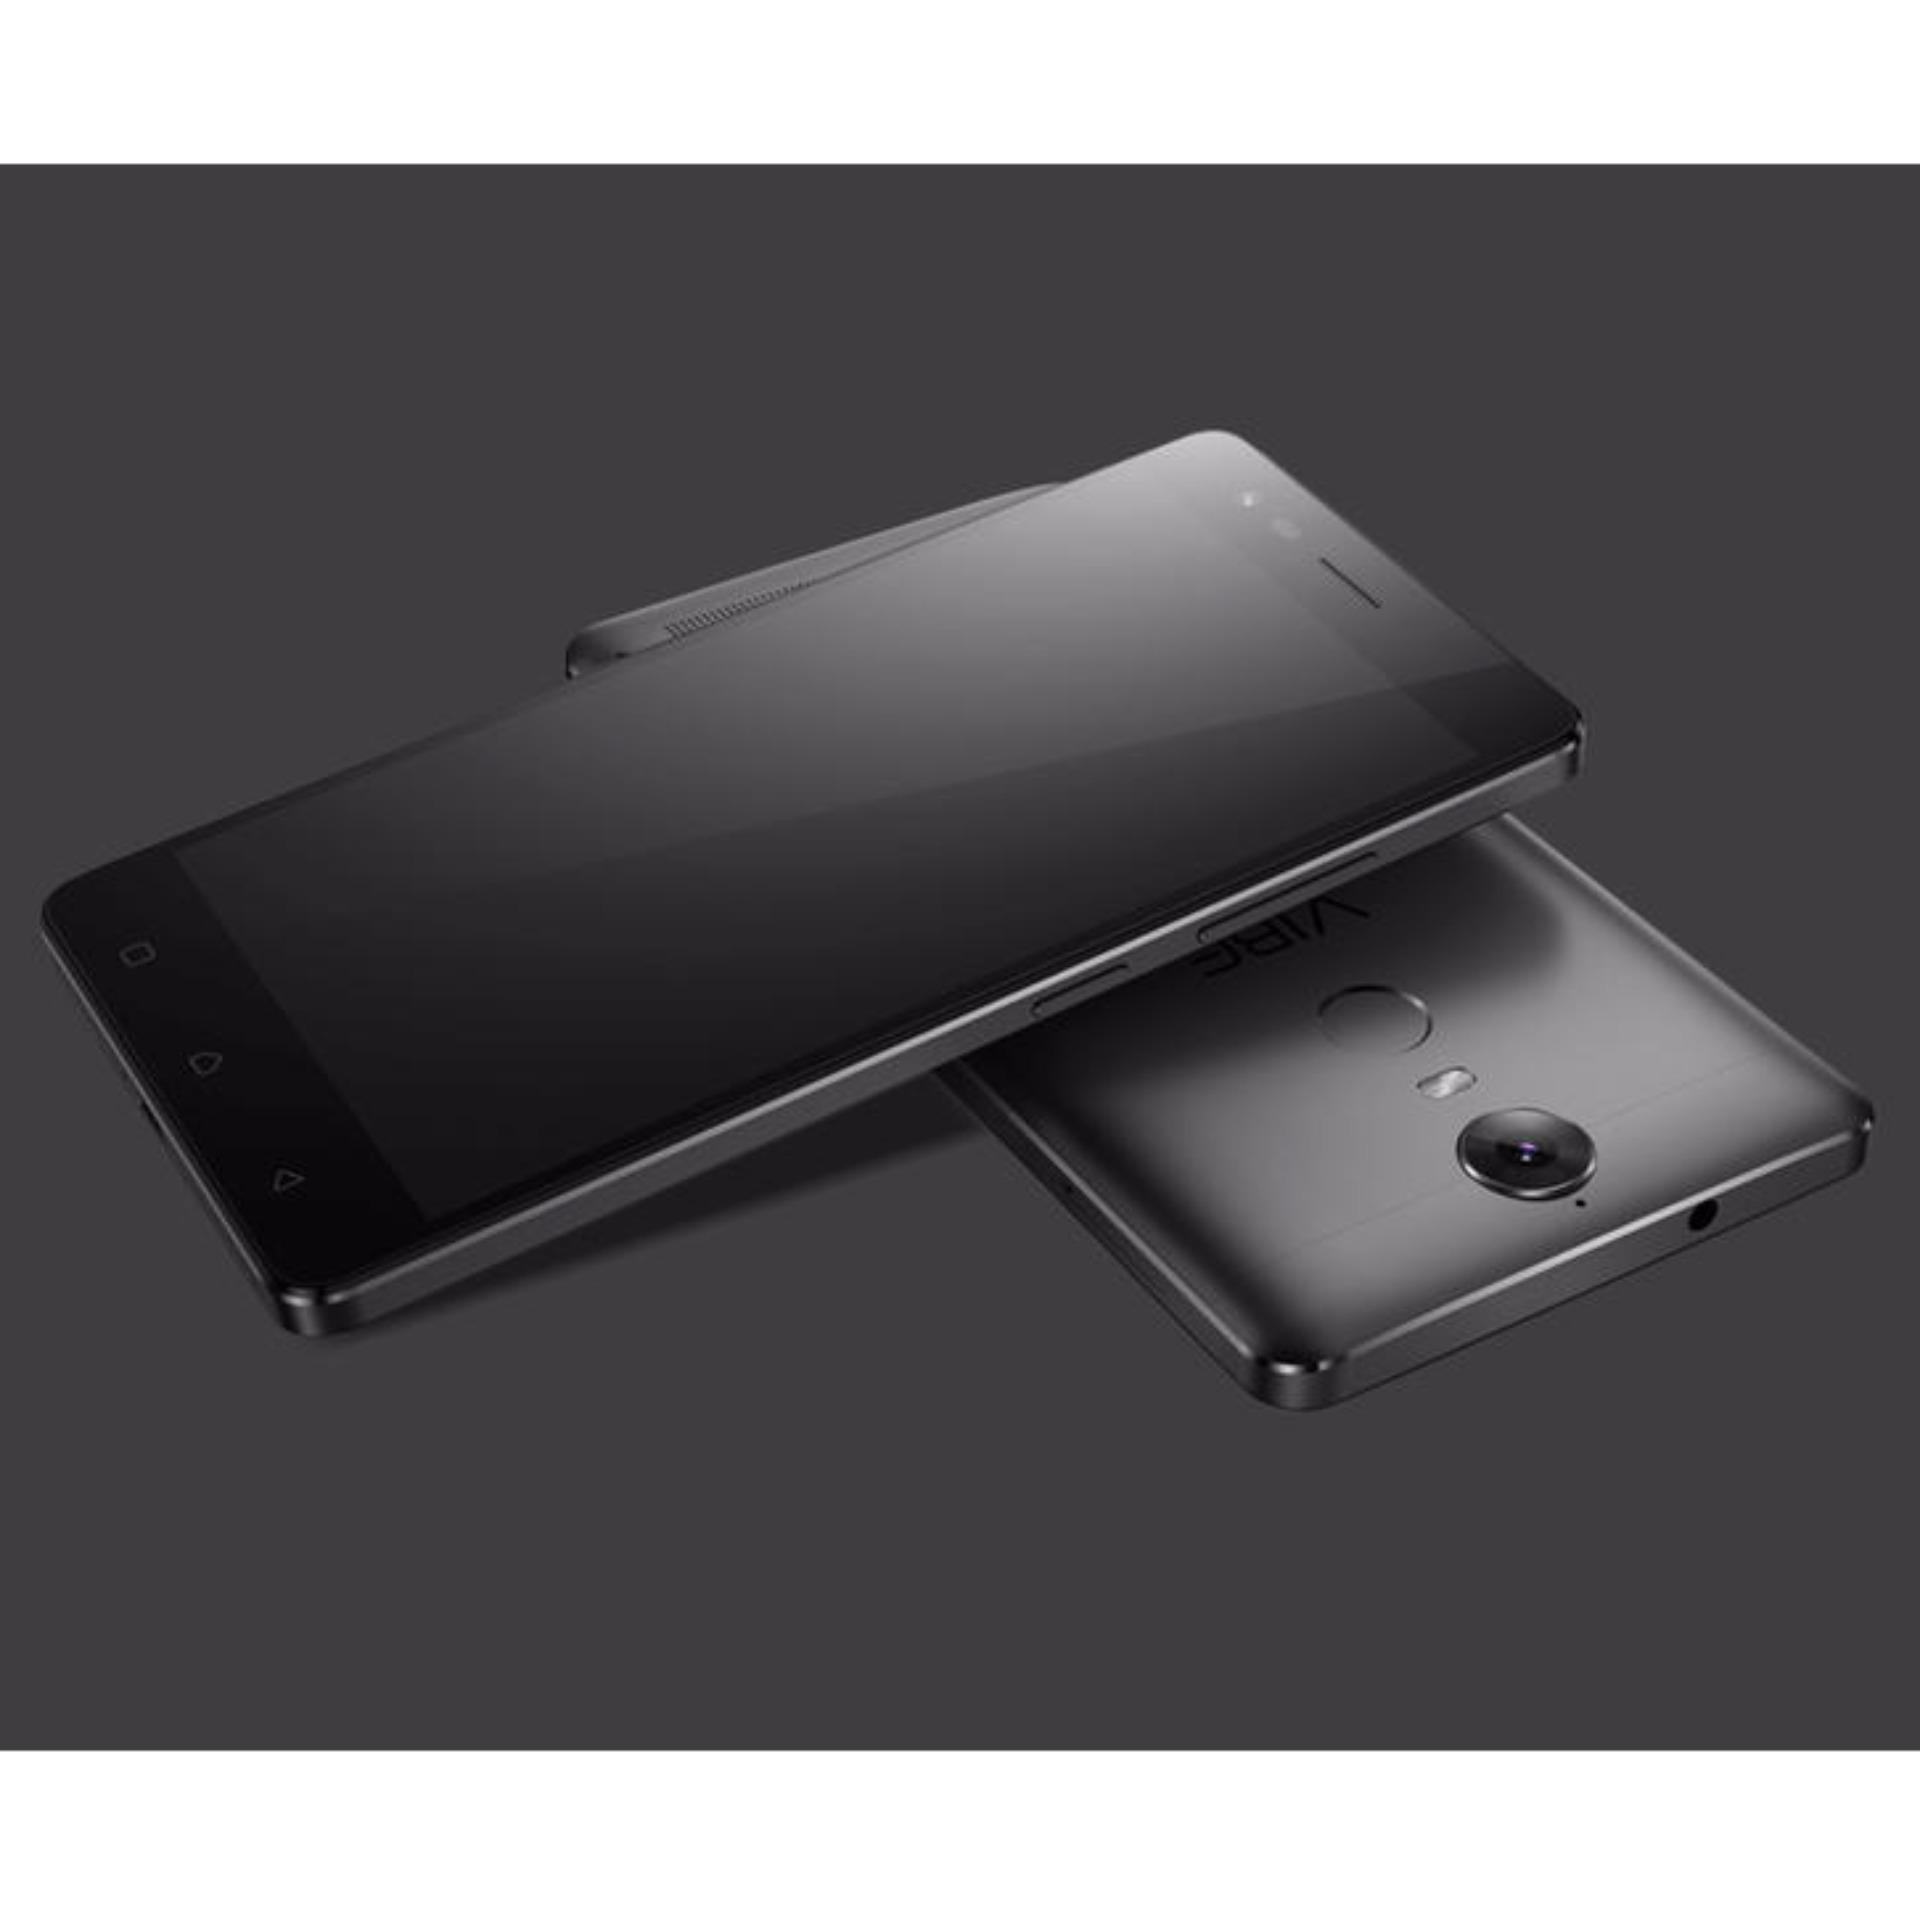 Lenovo Vibe K5 Note A7020(GREY) LTE 32GB – Local Set